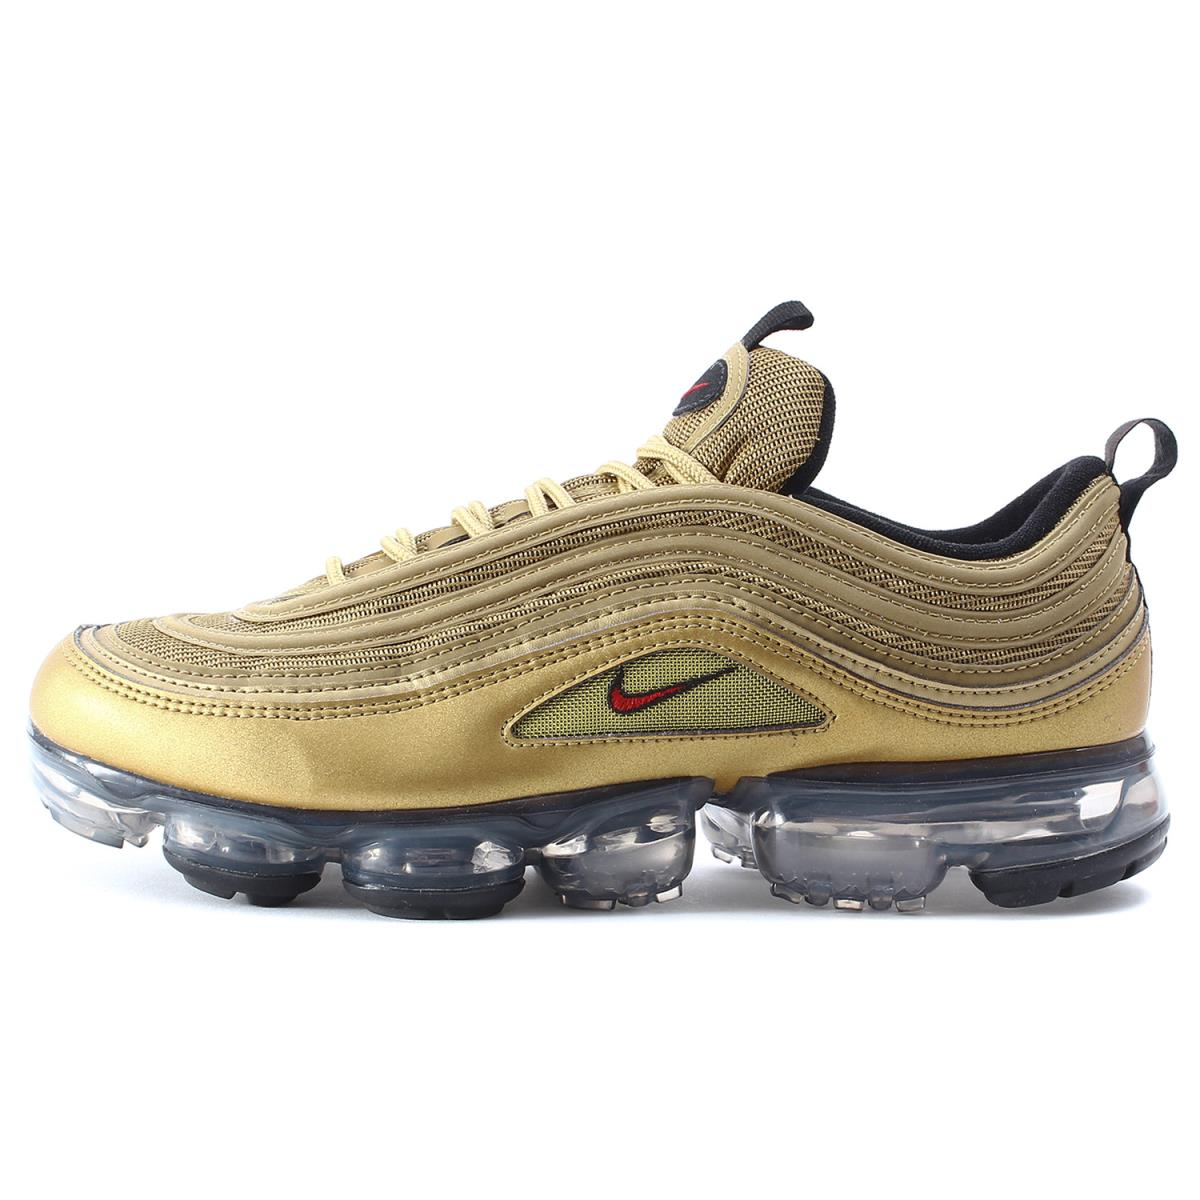 buy popular 617b7 db2df NIKE (Nike) AIR VAPORMAX 97 METALLIC GOLD (AJ7291-700) metallic gold  US9.5(27.5cm)